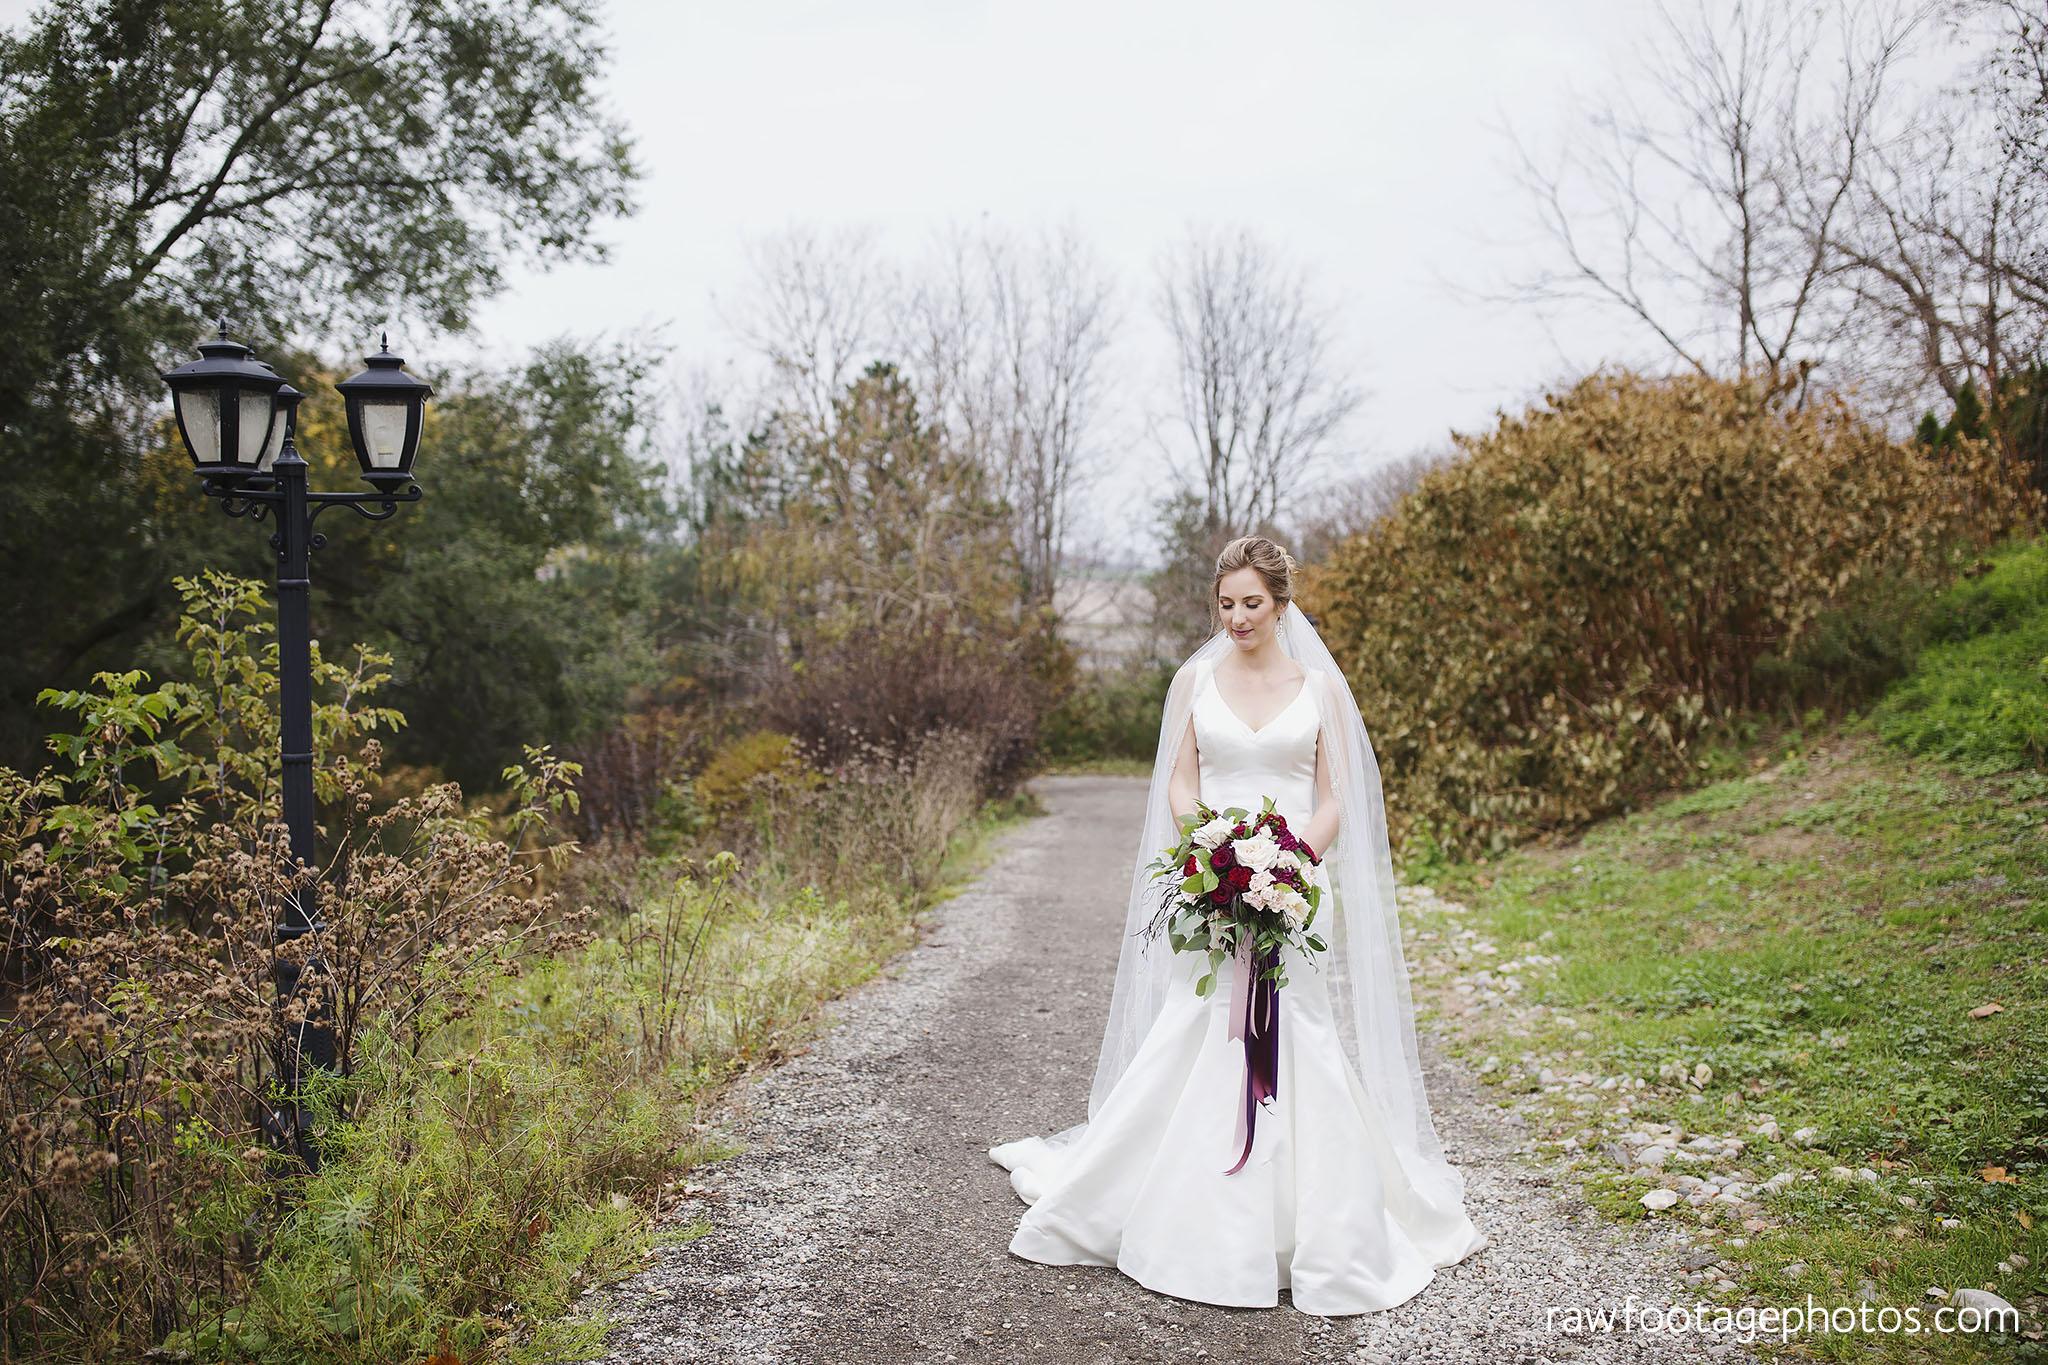 london_ontario_wedding_photos-fall_wedding_photography-raw_footage_photography-elm_hurst_inn_wedding027.jpg